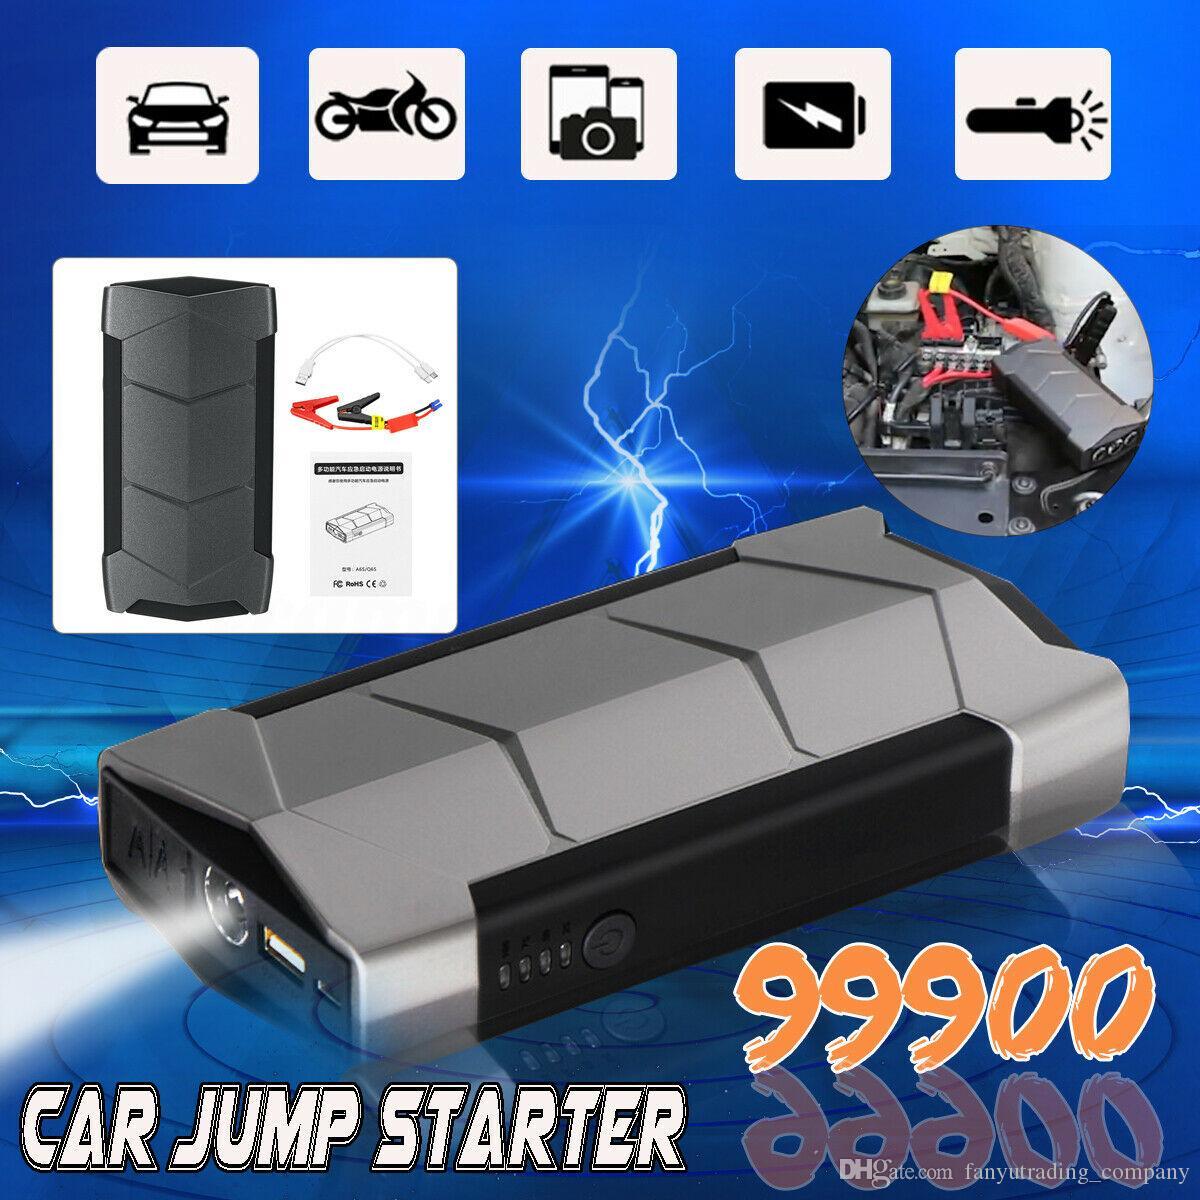 Mini Portable 12V 99900mAh Car Jump Starter Battery USB Charger Emergency Power Bank for Car Battery Booster Starting Device